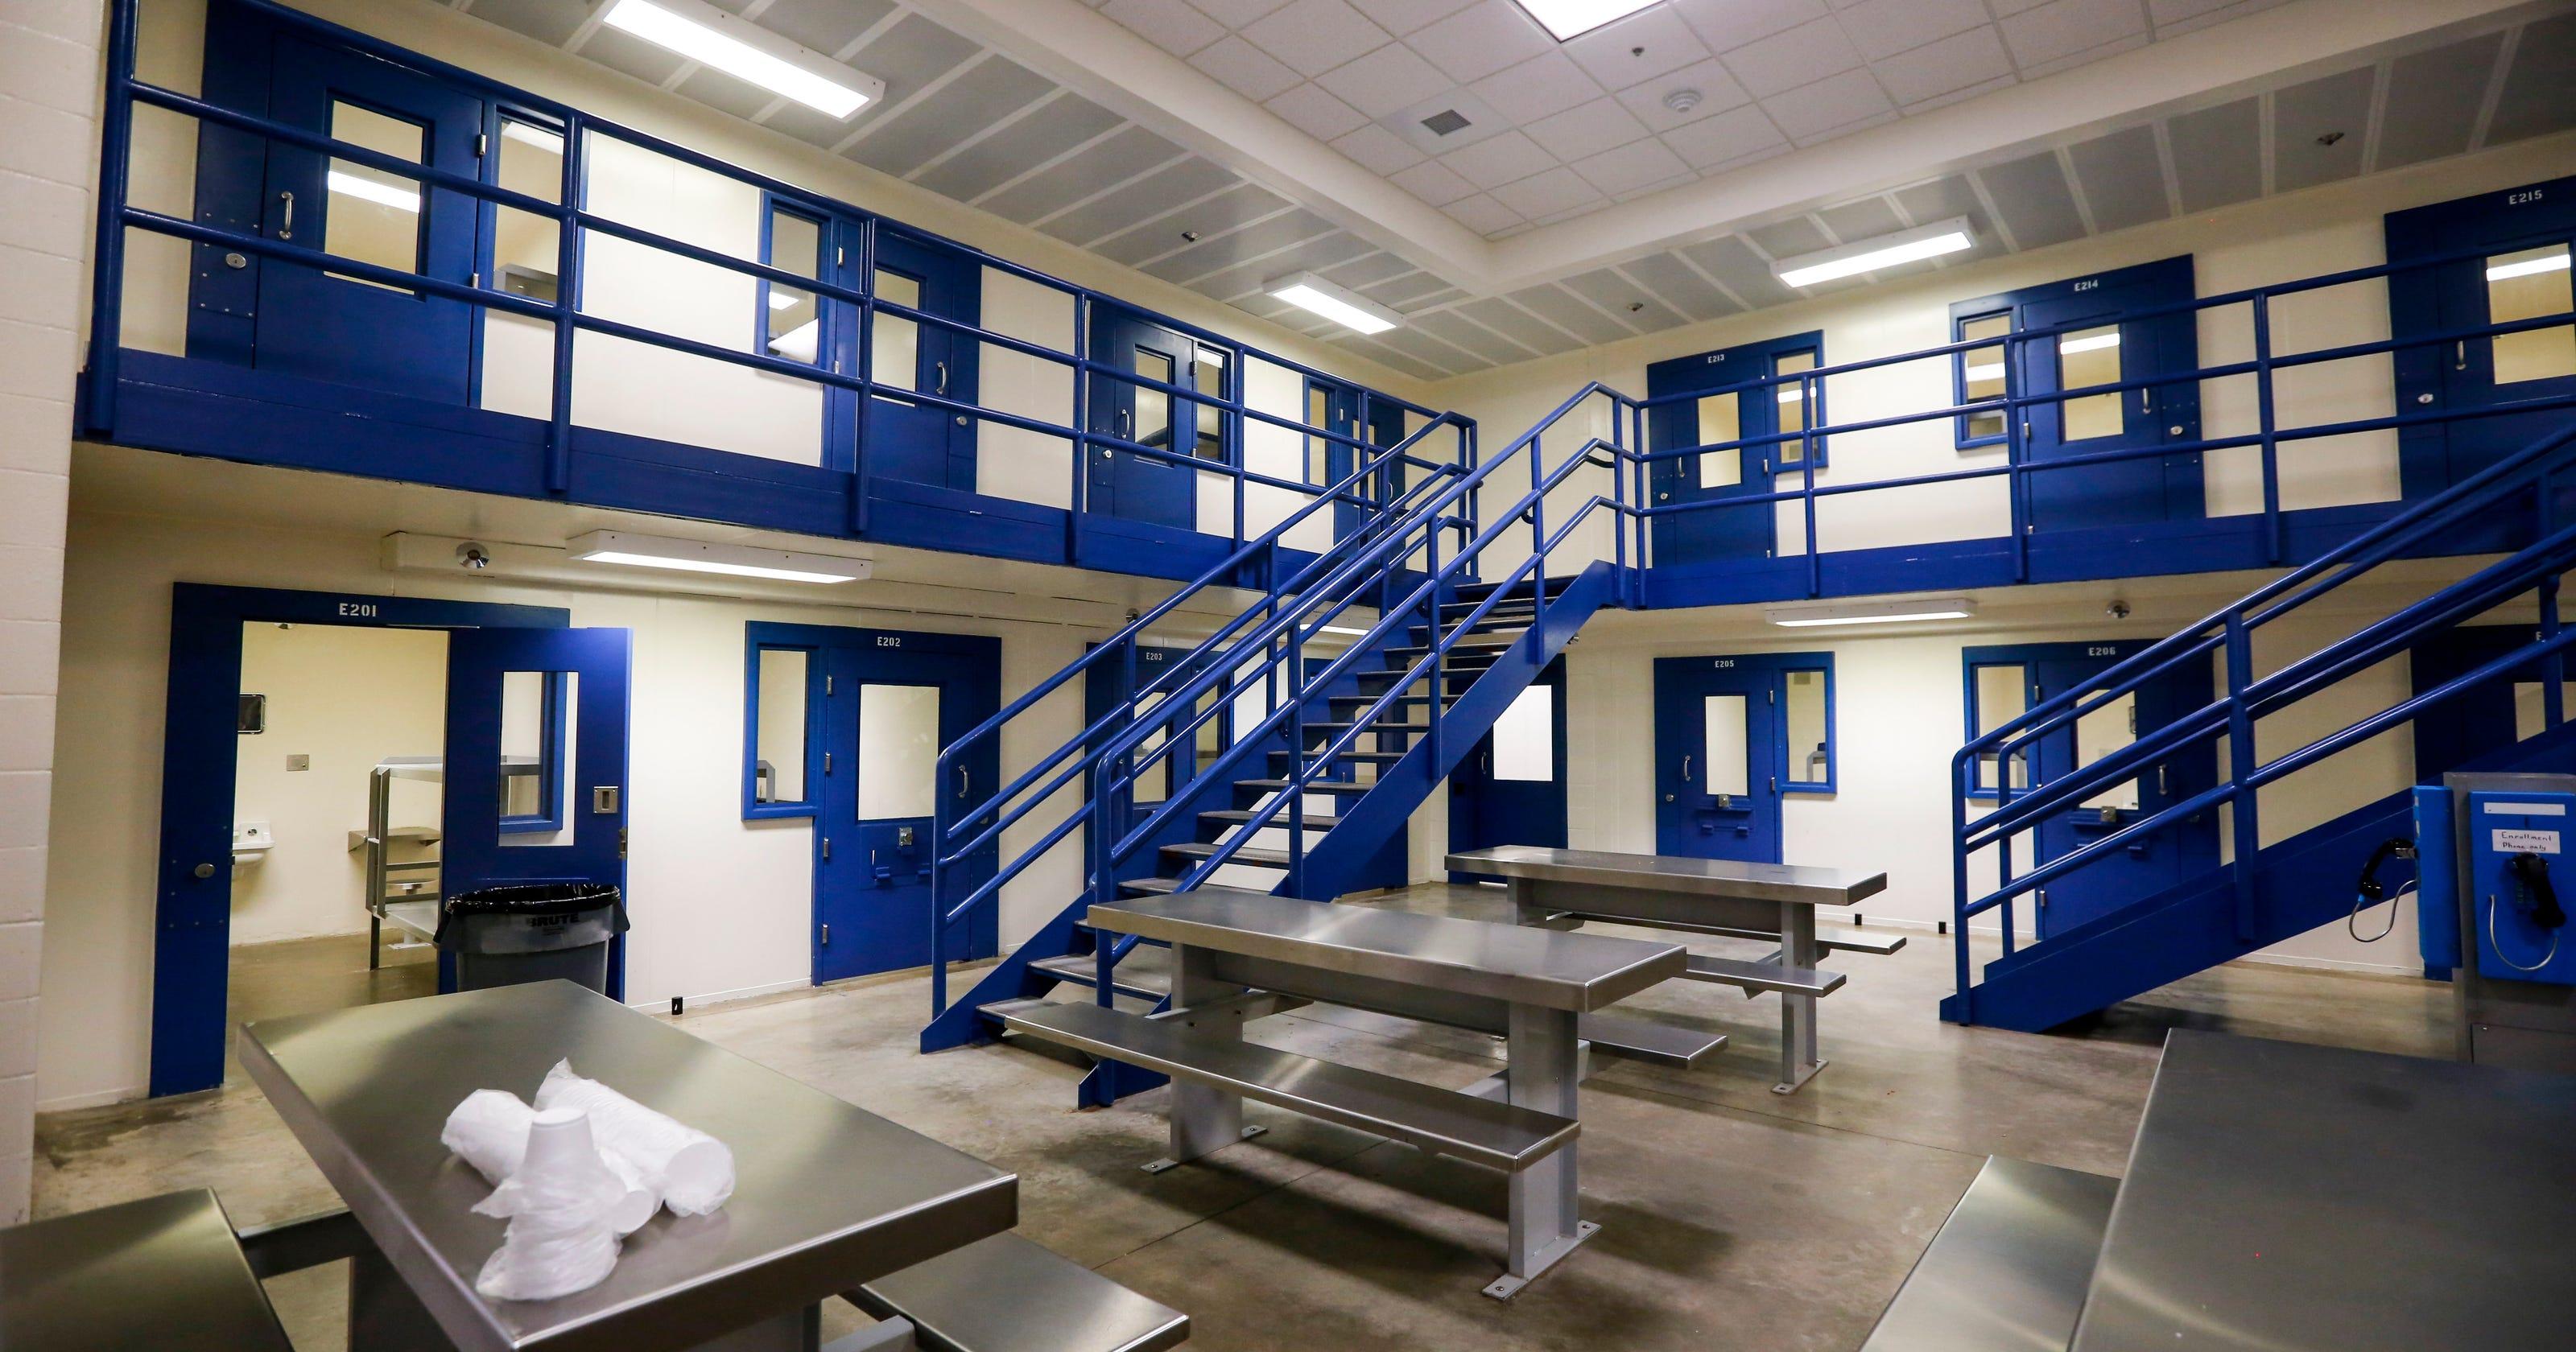 Polk County Jail staff find handgun on Des Moines inmate at booking